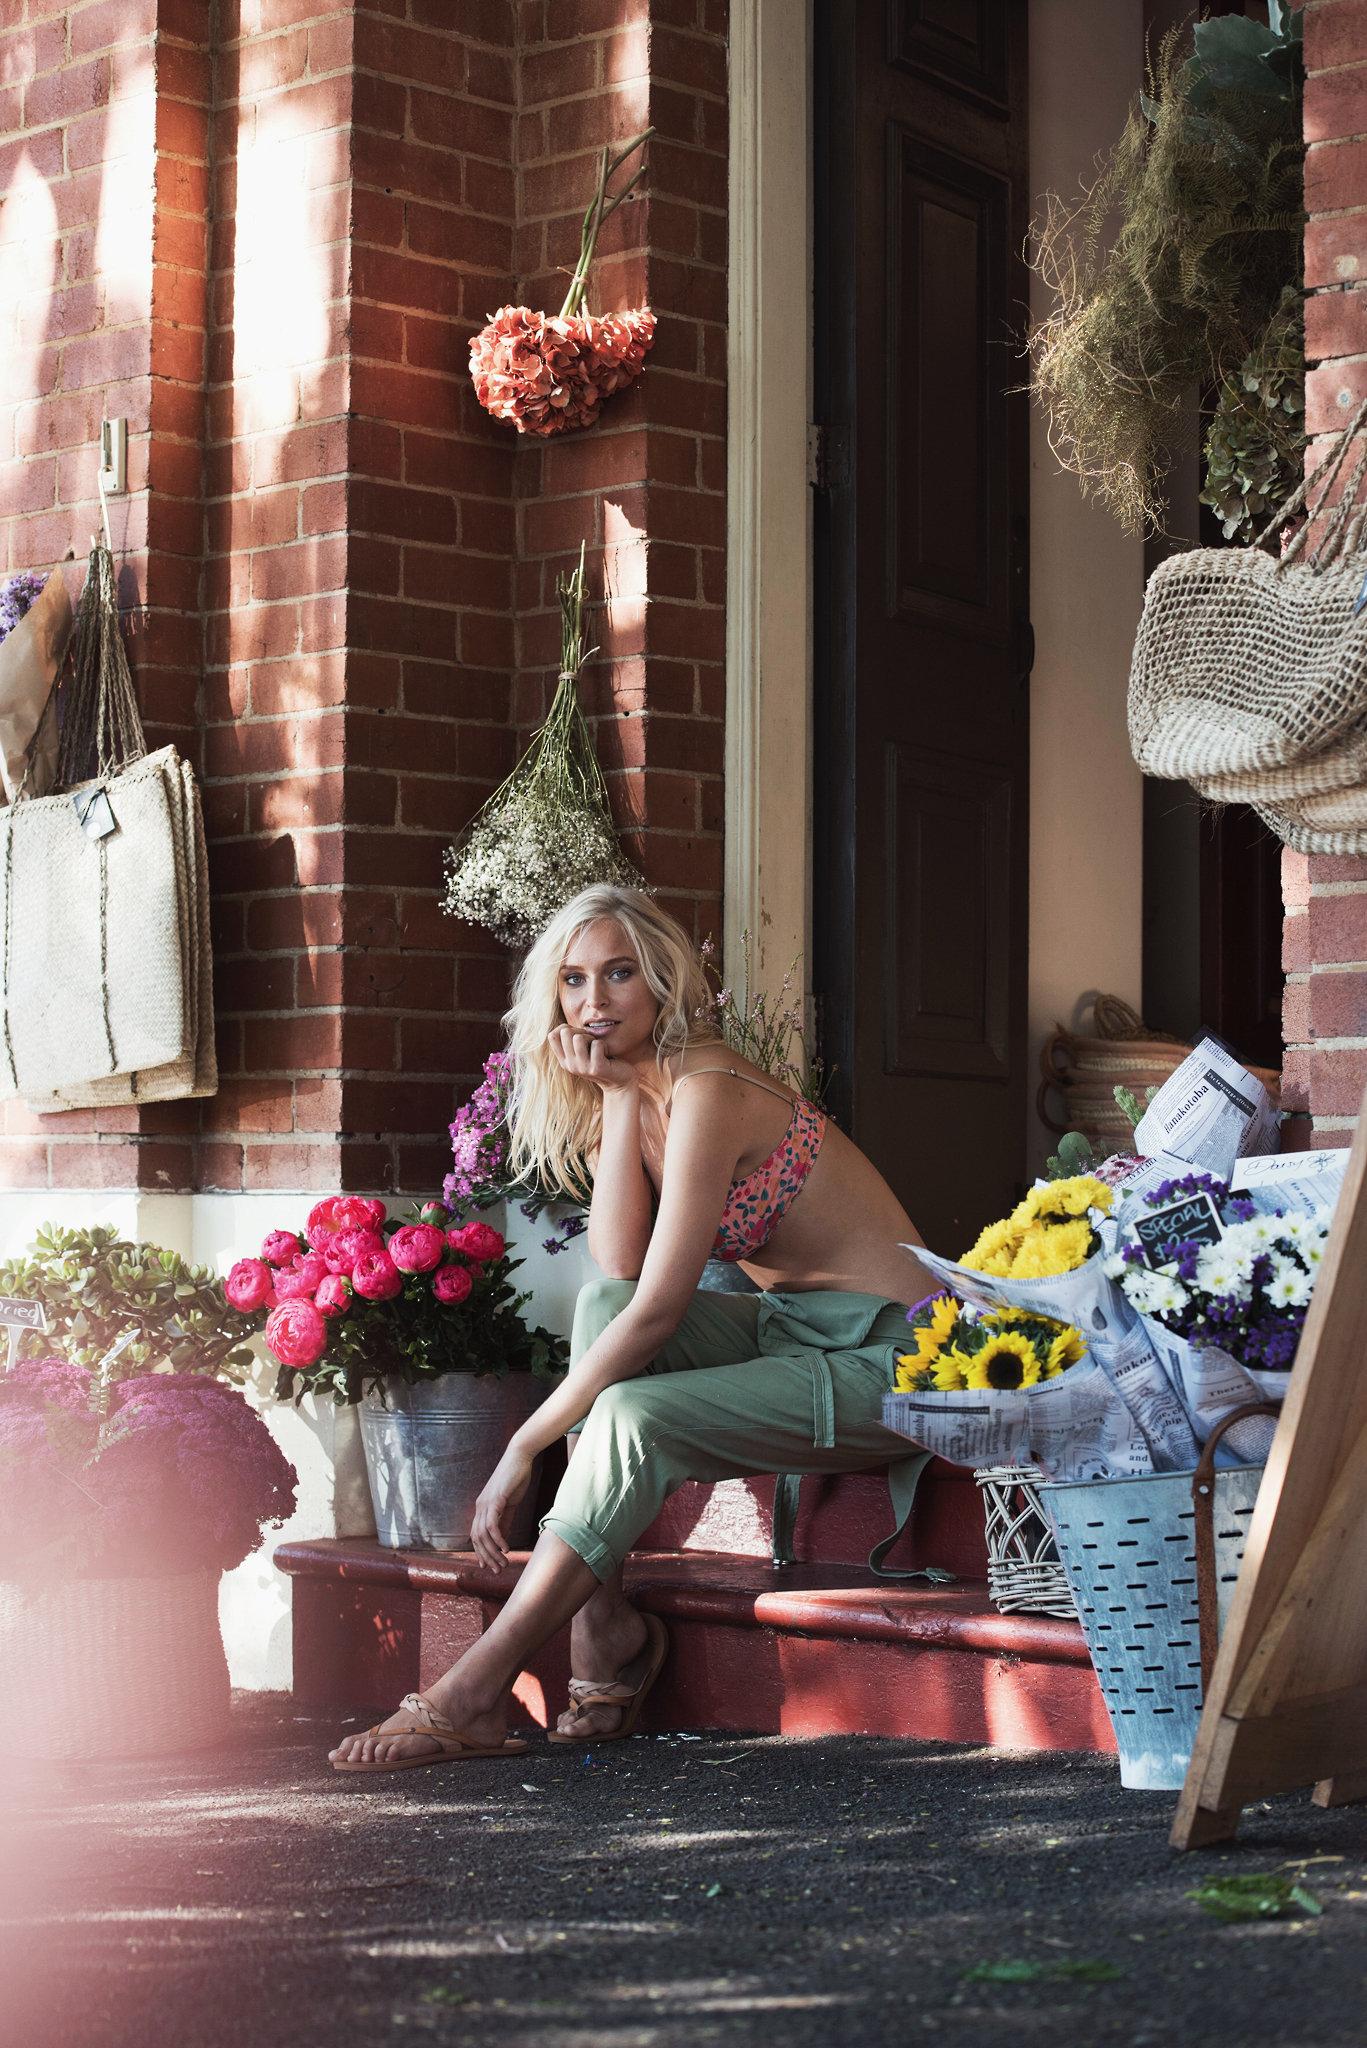 Bimby + Roy 'AW18 - Bimby + Roy AW18 Campaign; ft.Ekaterina Pokrovskaya. Photographs by Dave Blake. The Flower Bar, Bangalow, Australia.